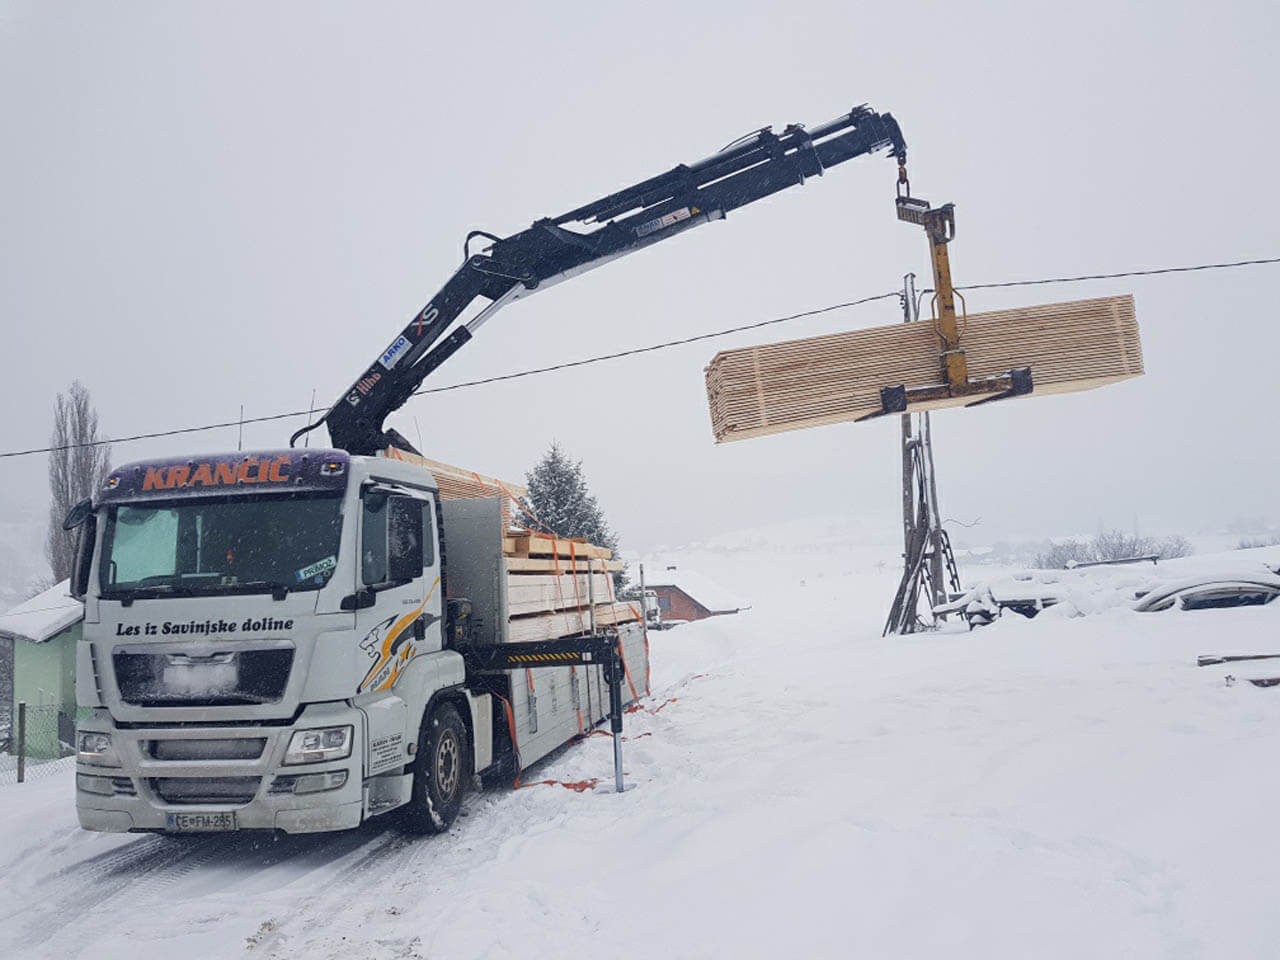 dostava-lesa-krancic-02